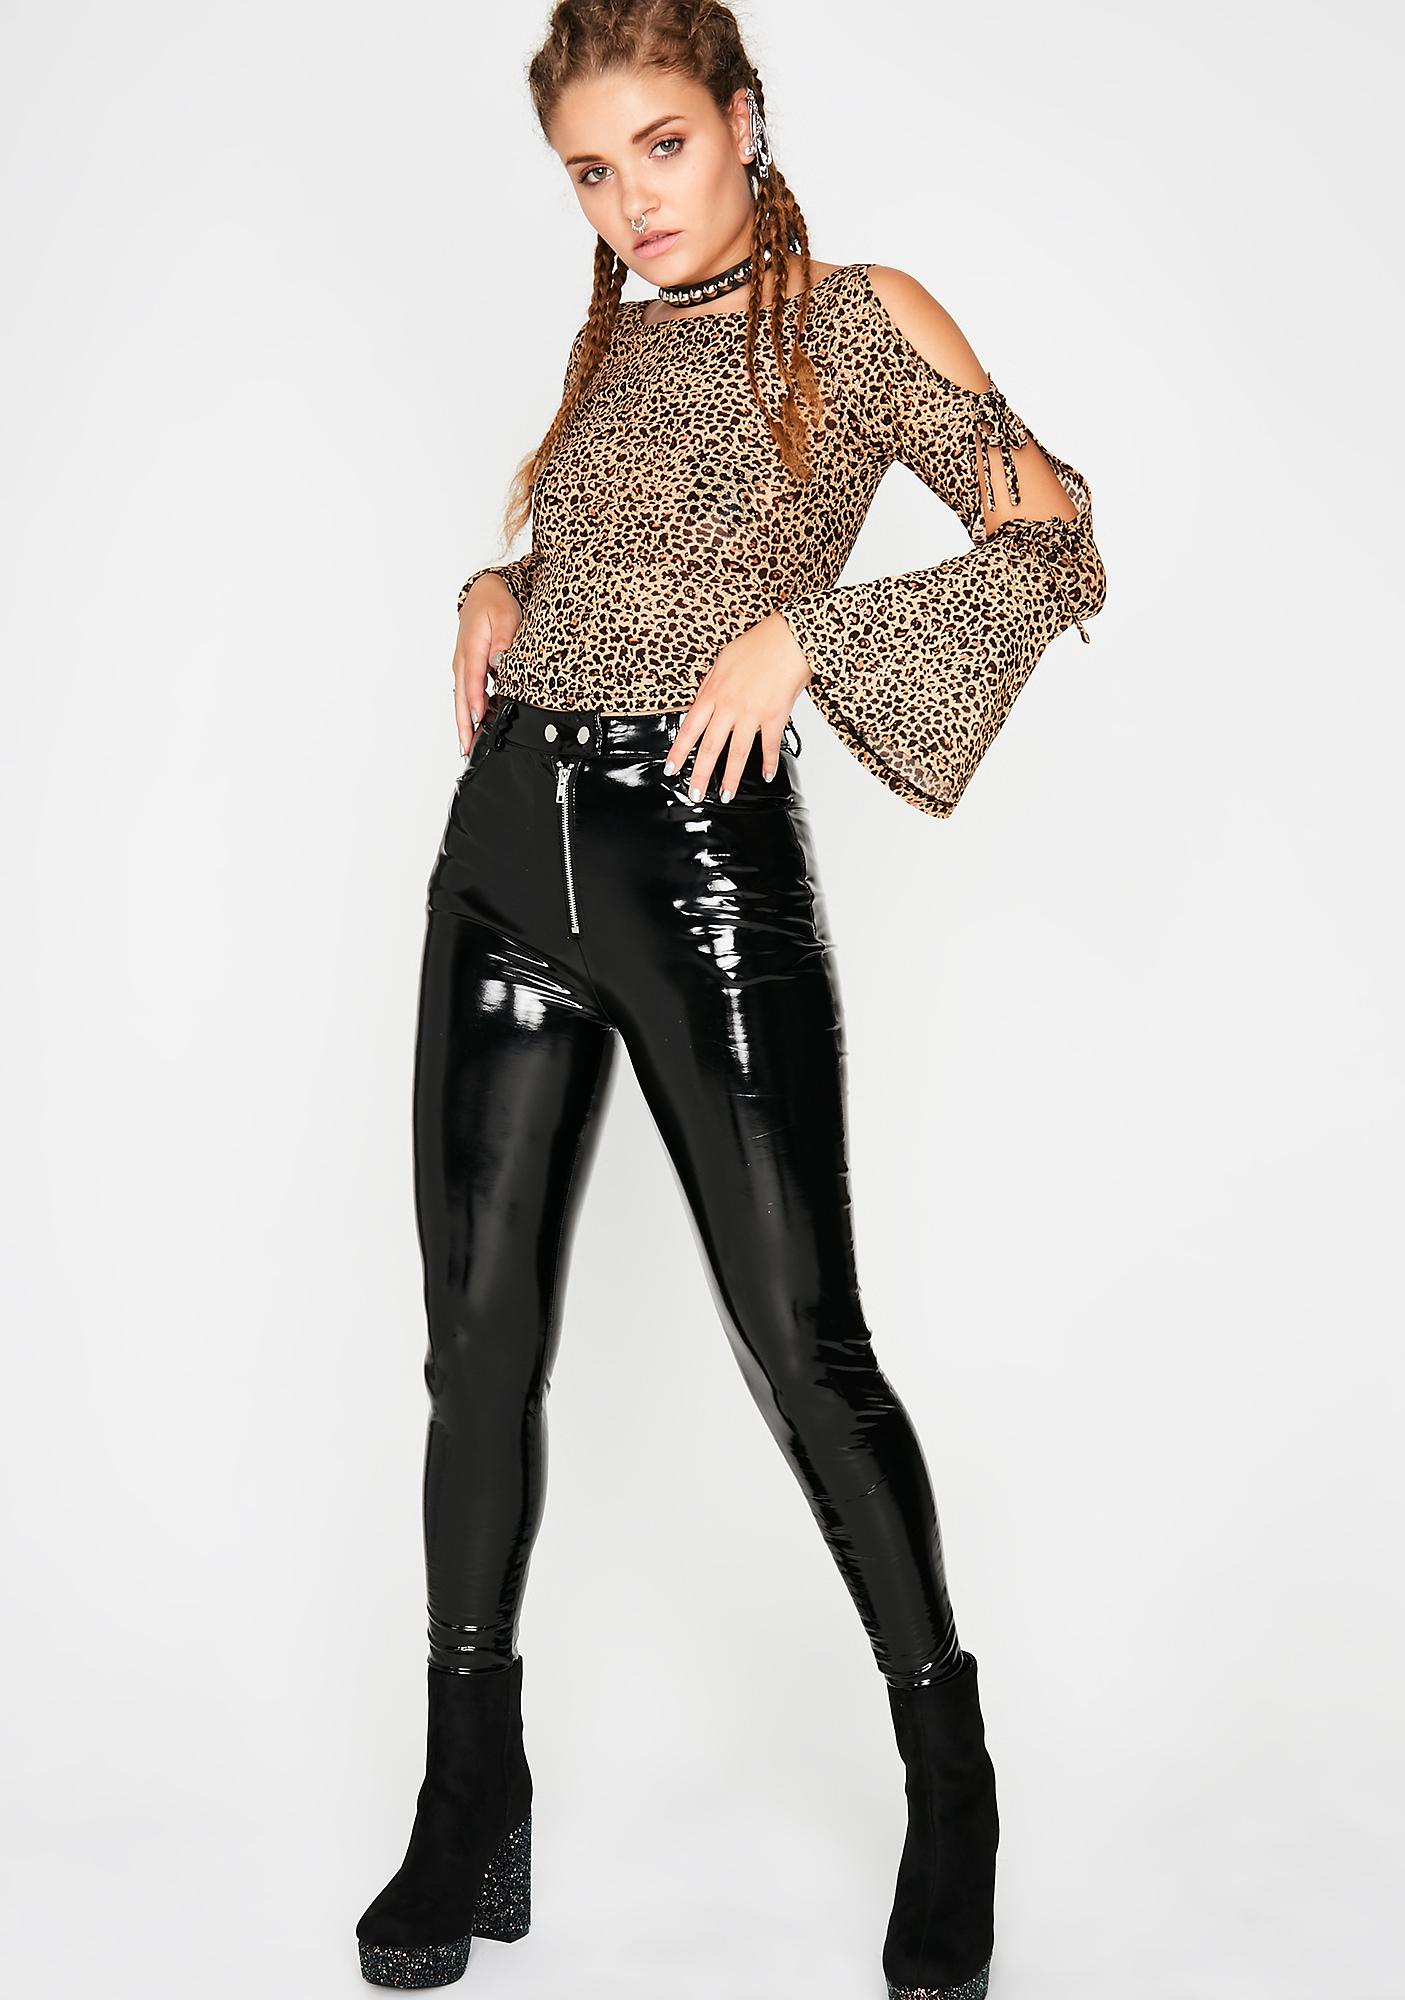 Cougar Mode Bell Sleeve Top